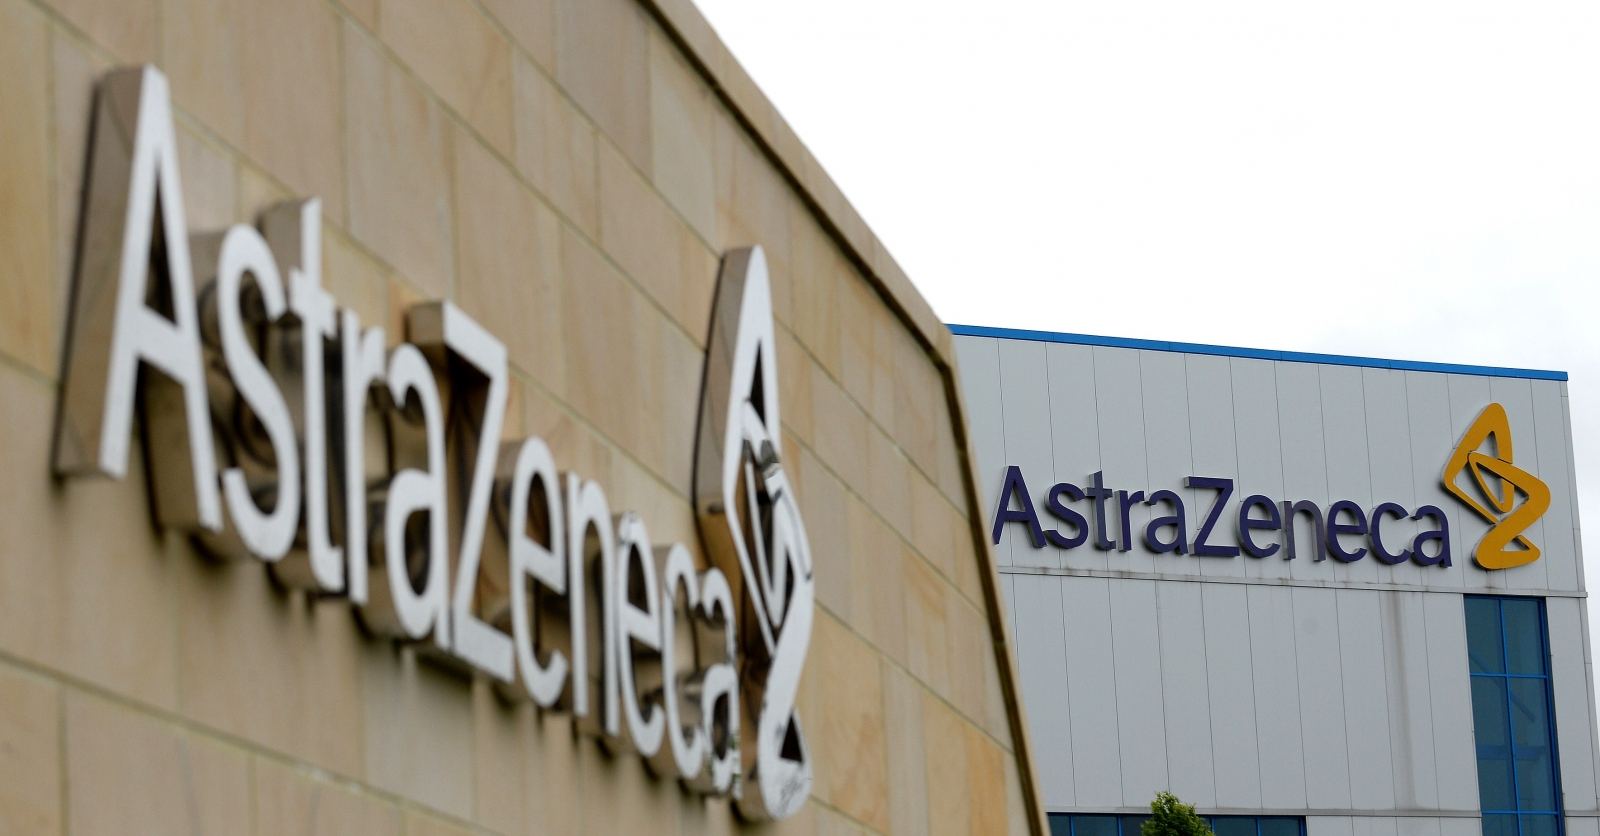 Pfizer Buys Astrazeneca S Antibiotics Business